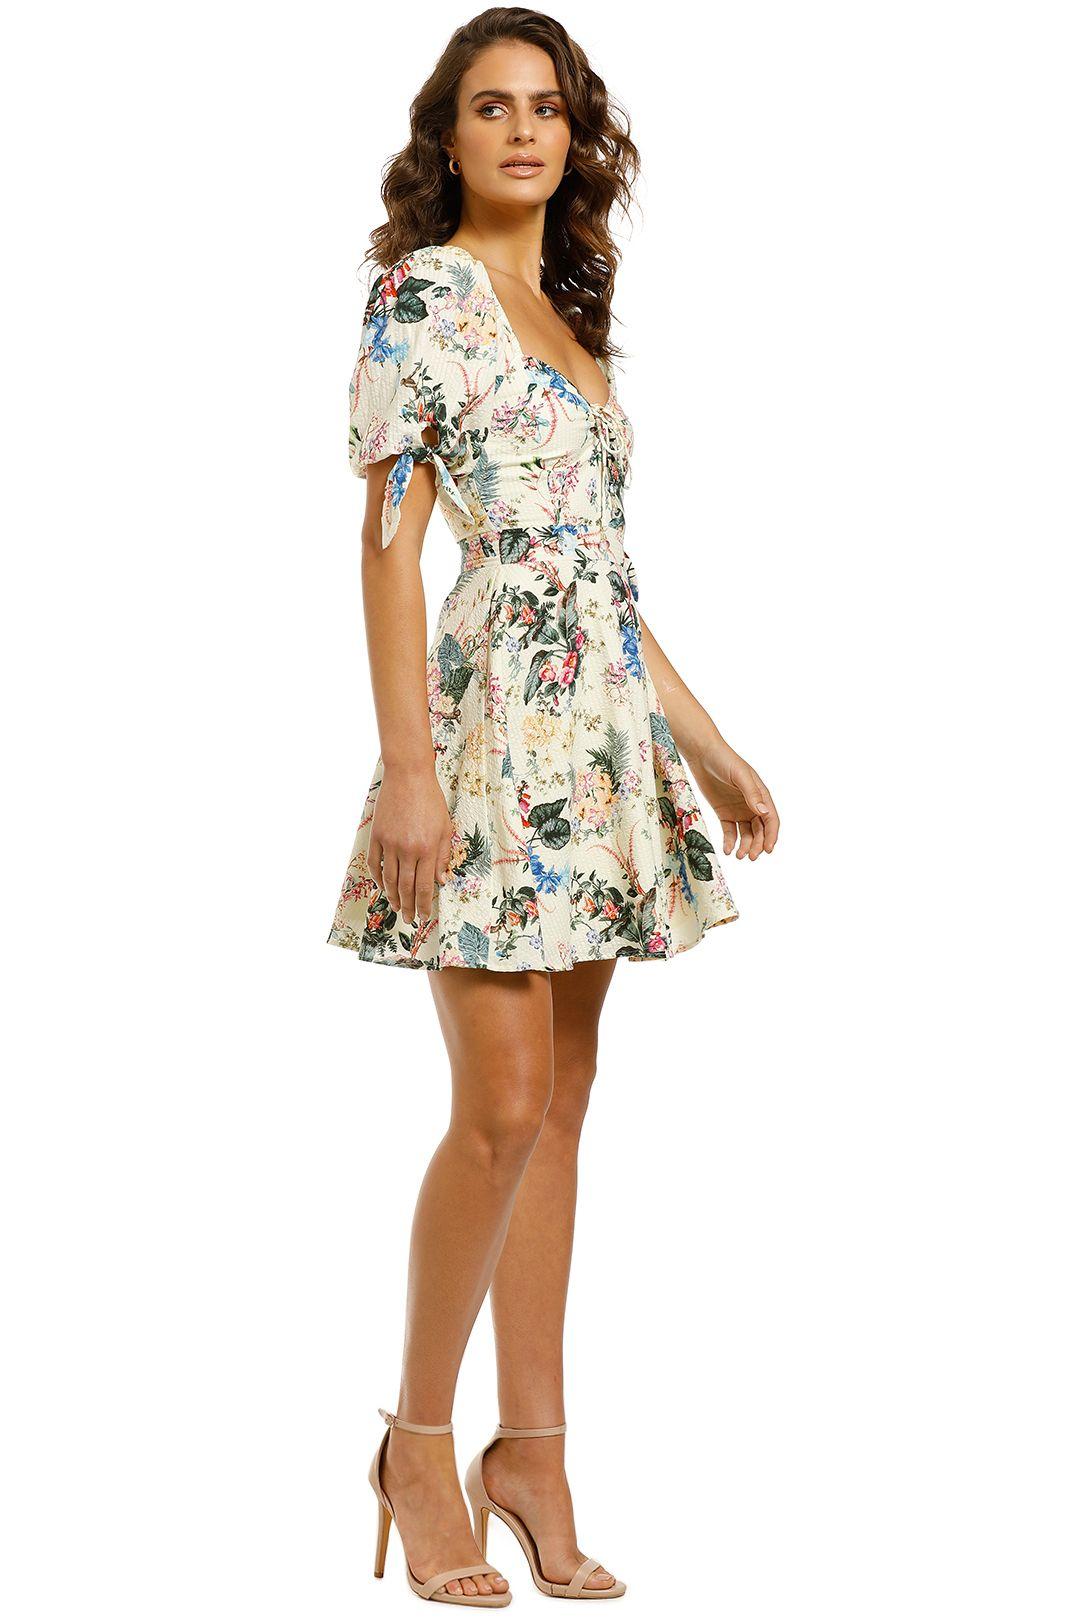 Tigerlily-Kalani-Short-Dress-Floral-Side